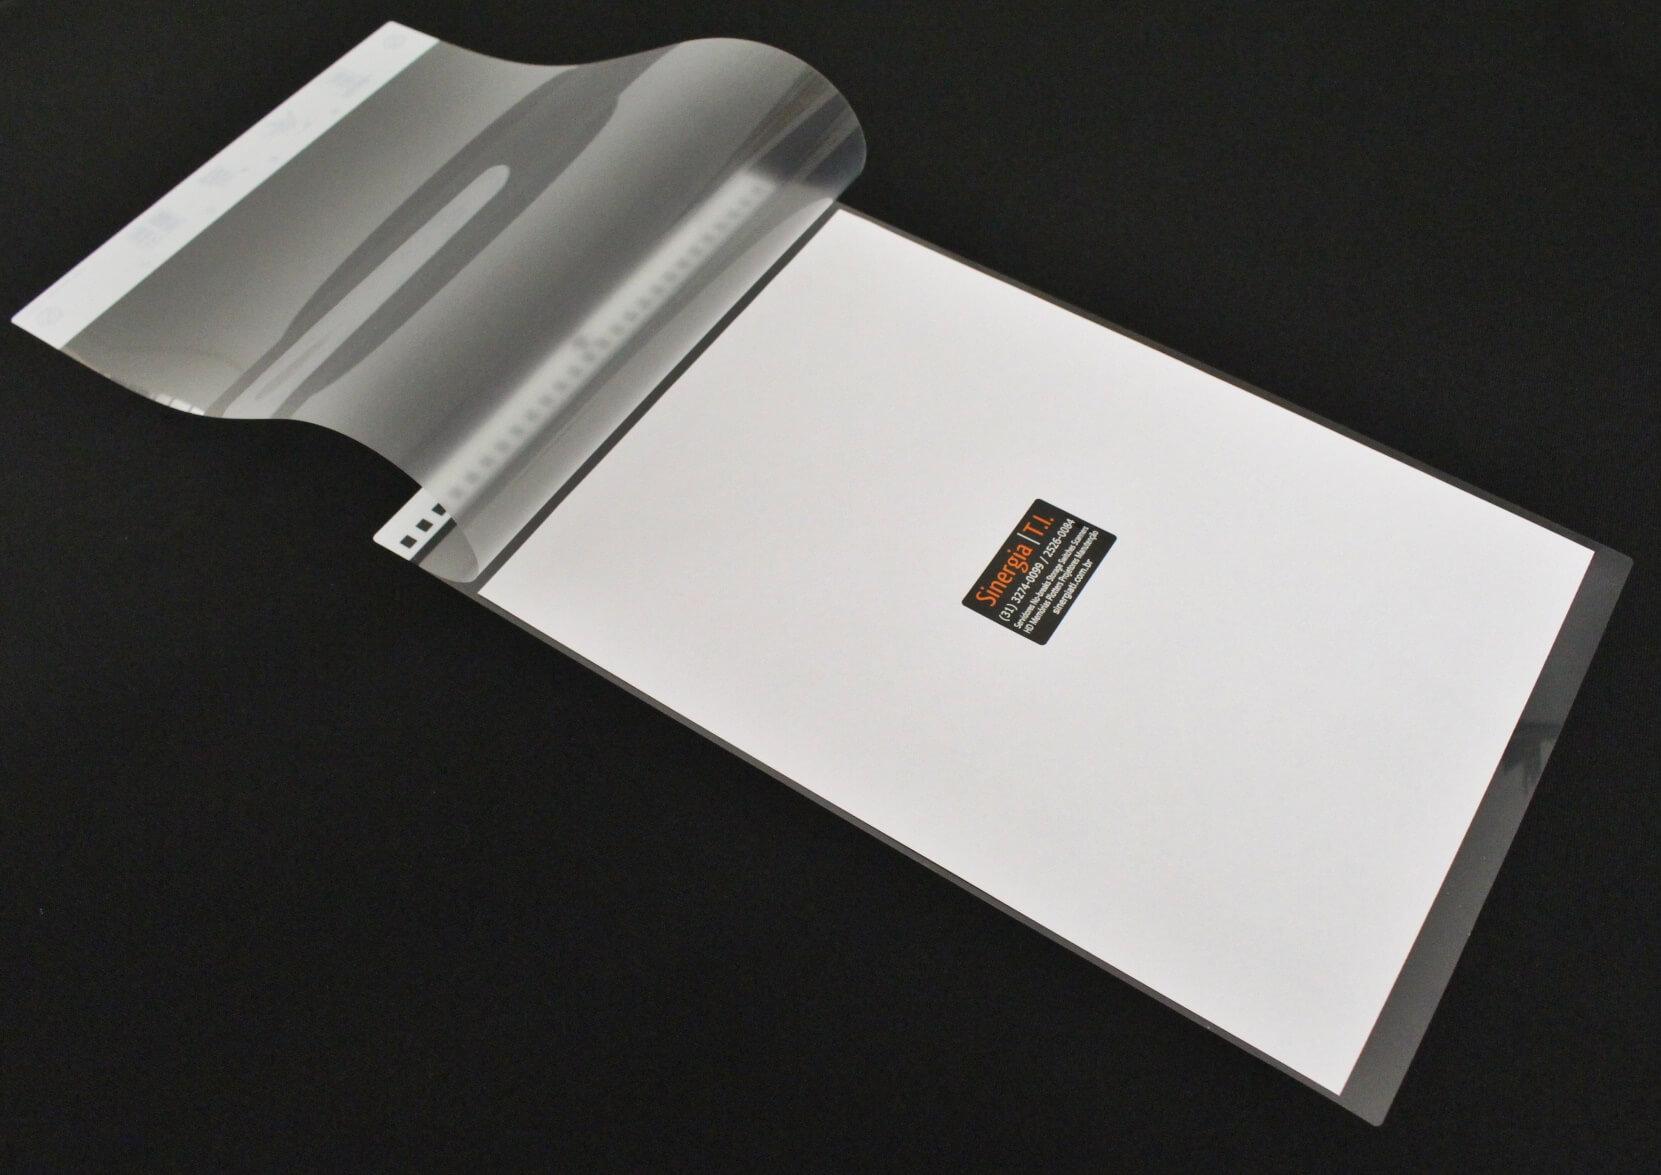 PA03630-F661 Folha de Transporte Carrier Sheet para Scanners Fujitsu A3